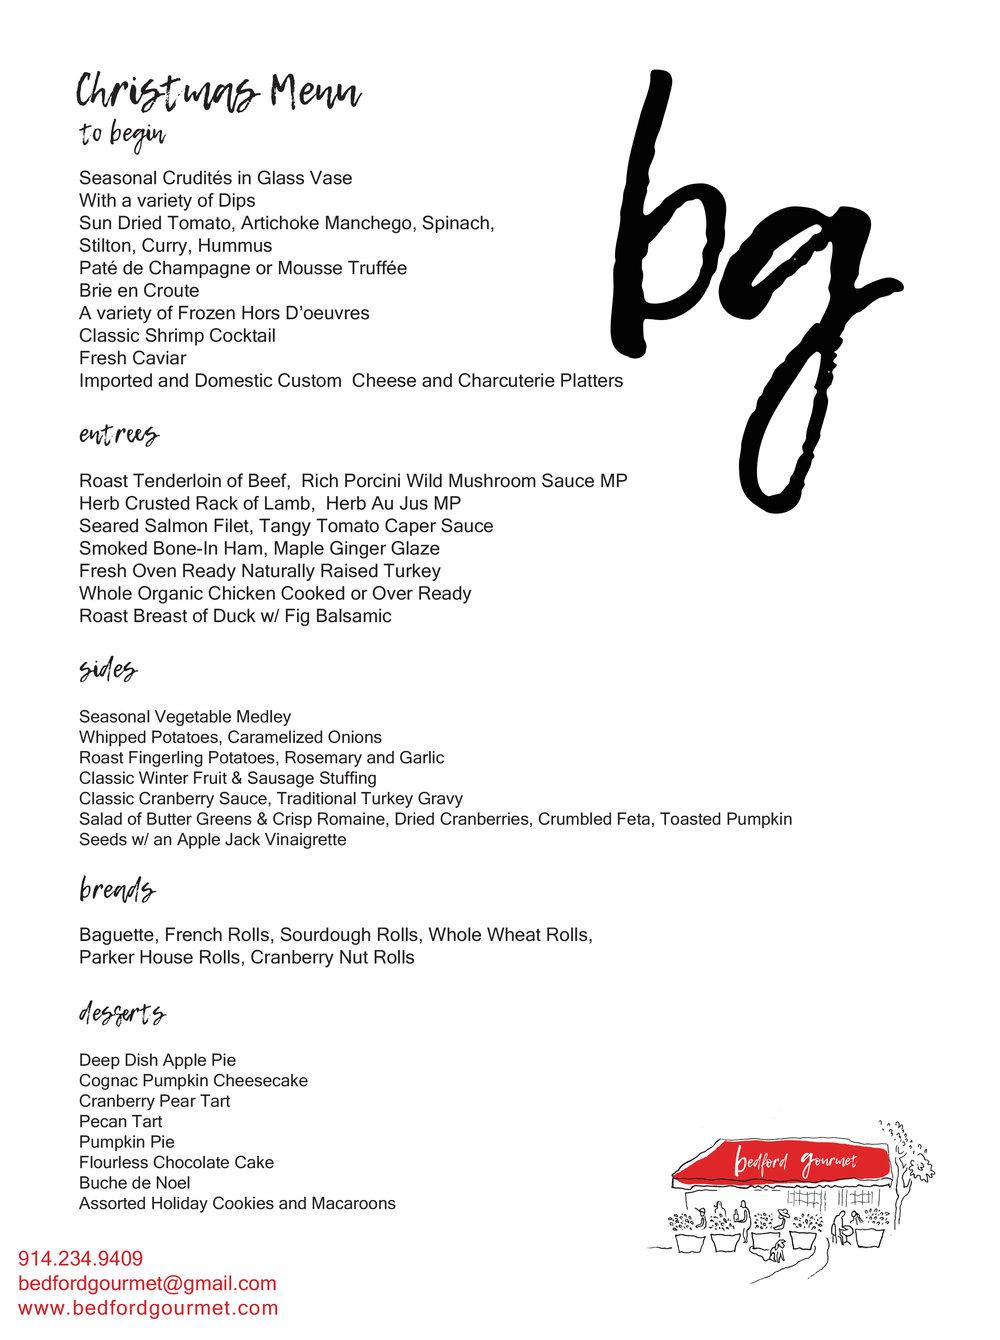 bg_christmas_menu_2018.jpg